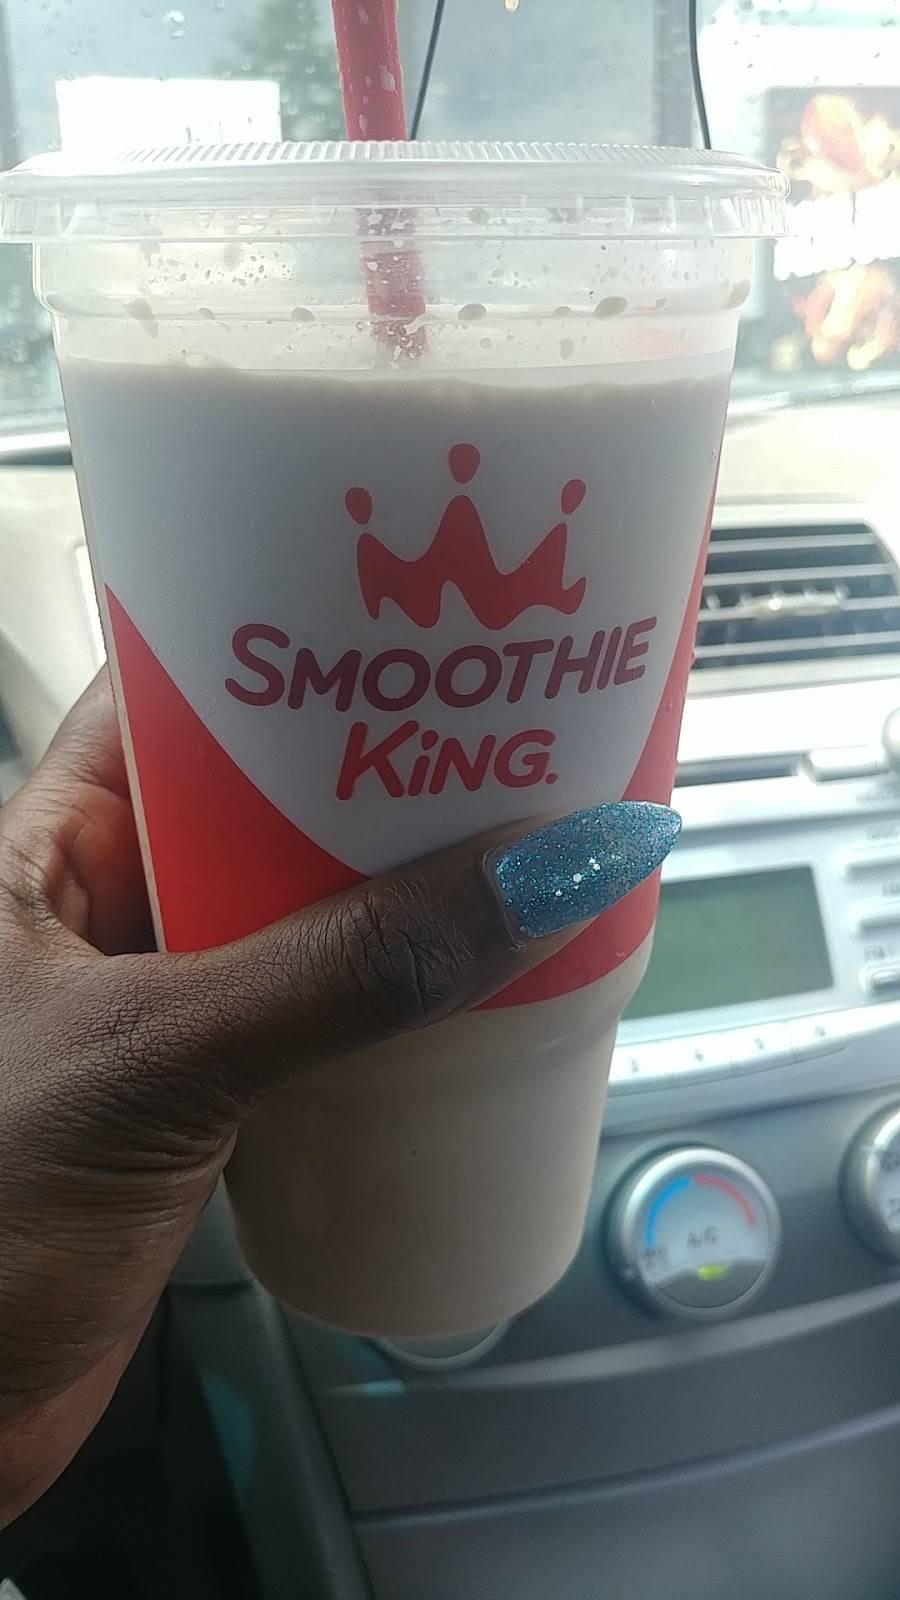 Smoothie King   restaurant   4920 Flat Shoals Pkwy #101, Decatur, GA 30034, USA   7703228771 OR +1 770-322-8771